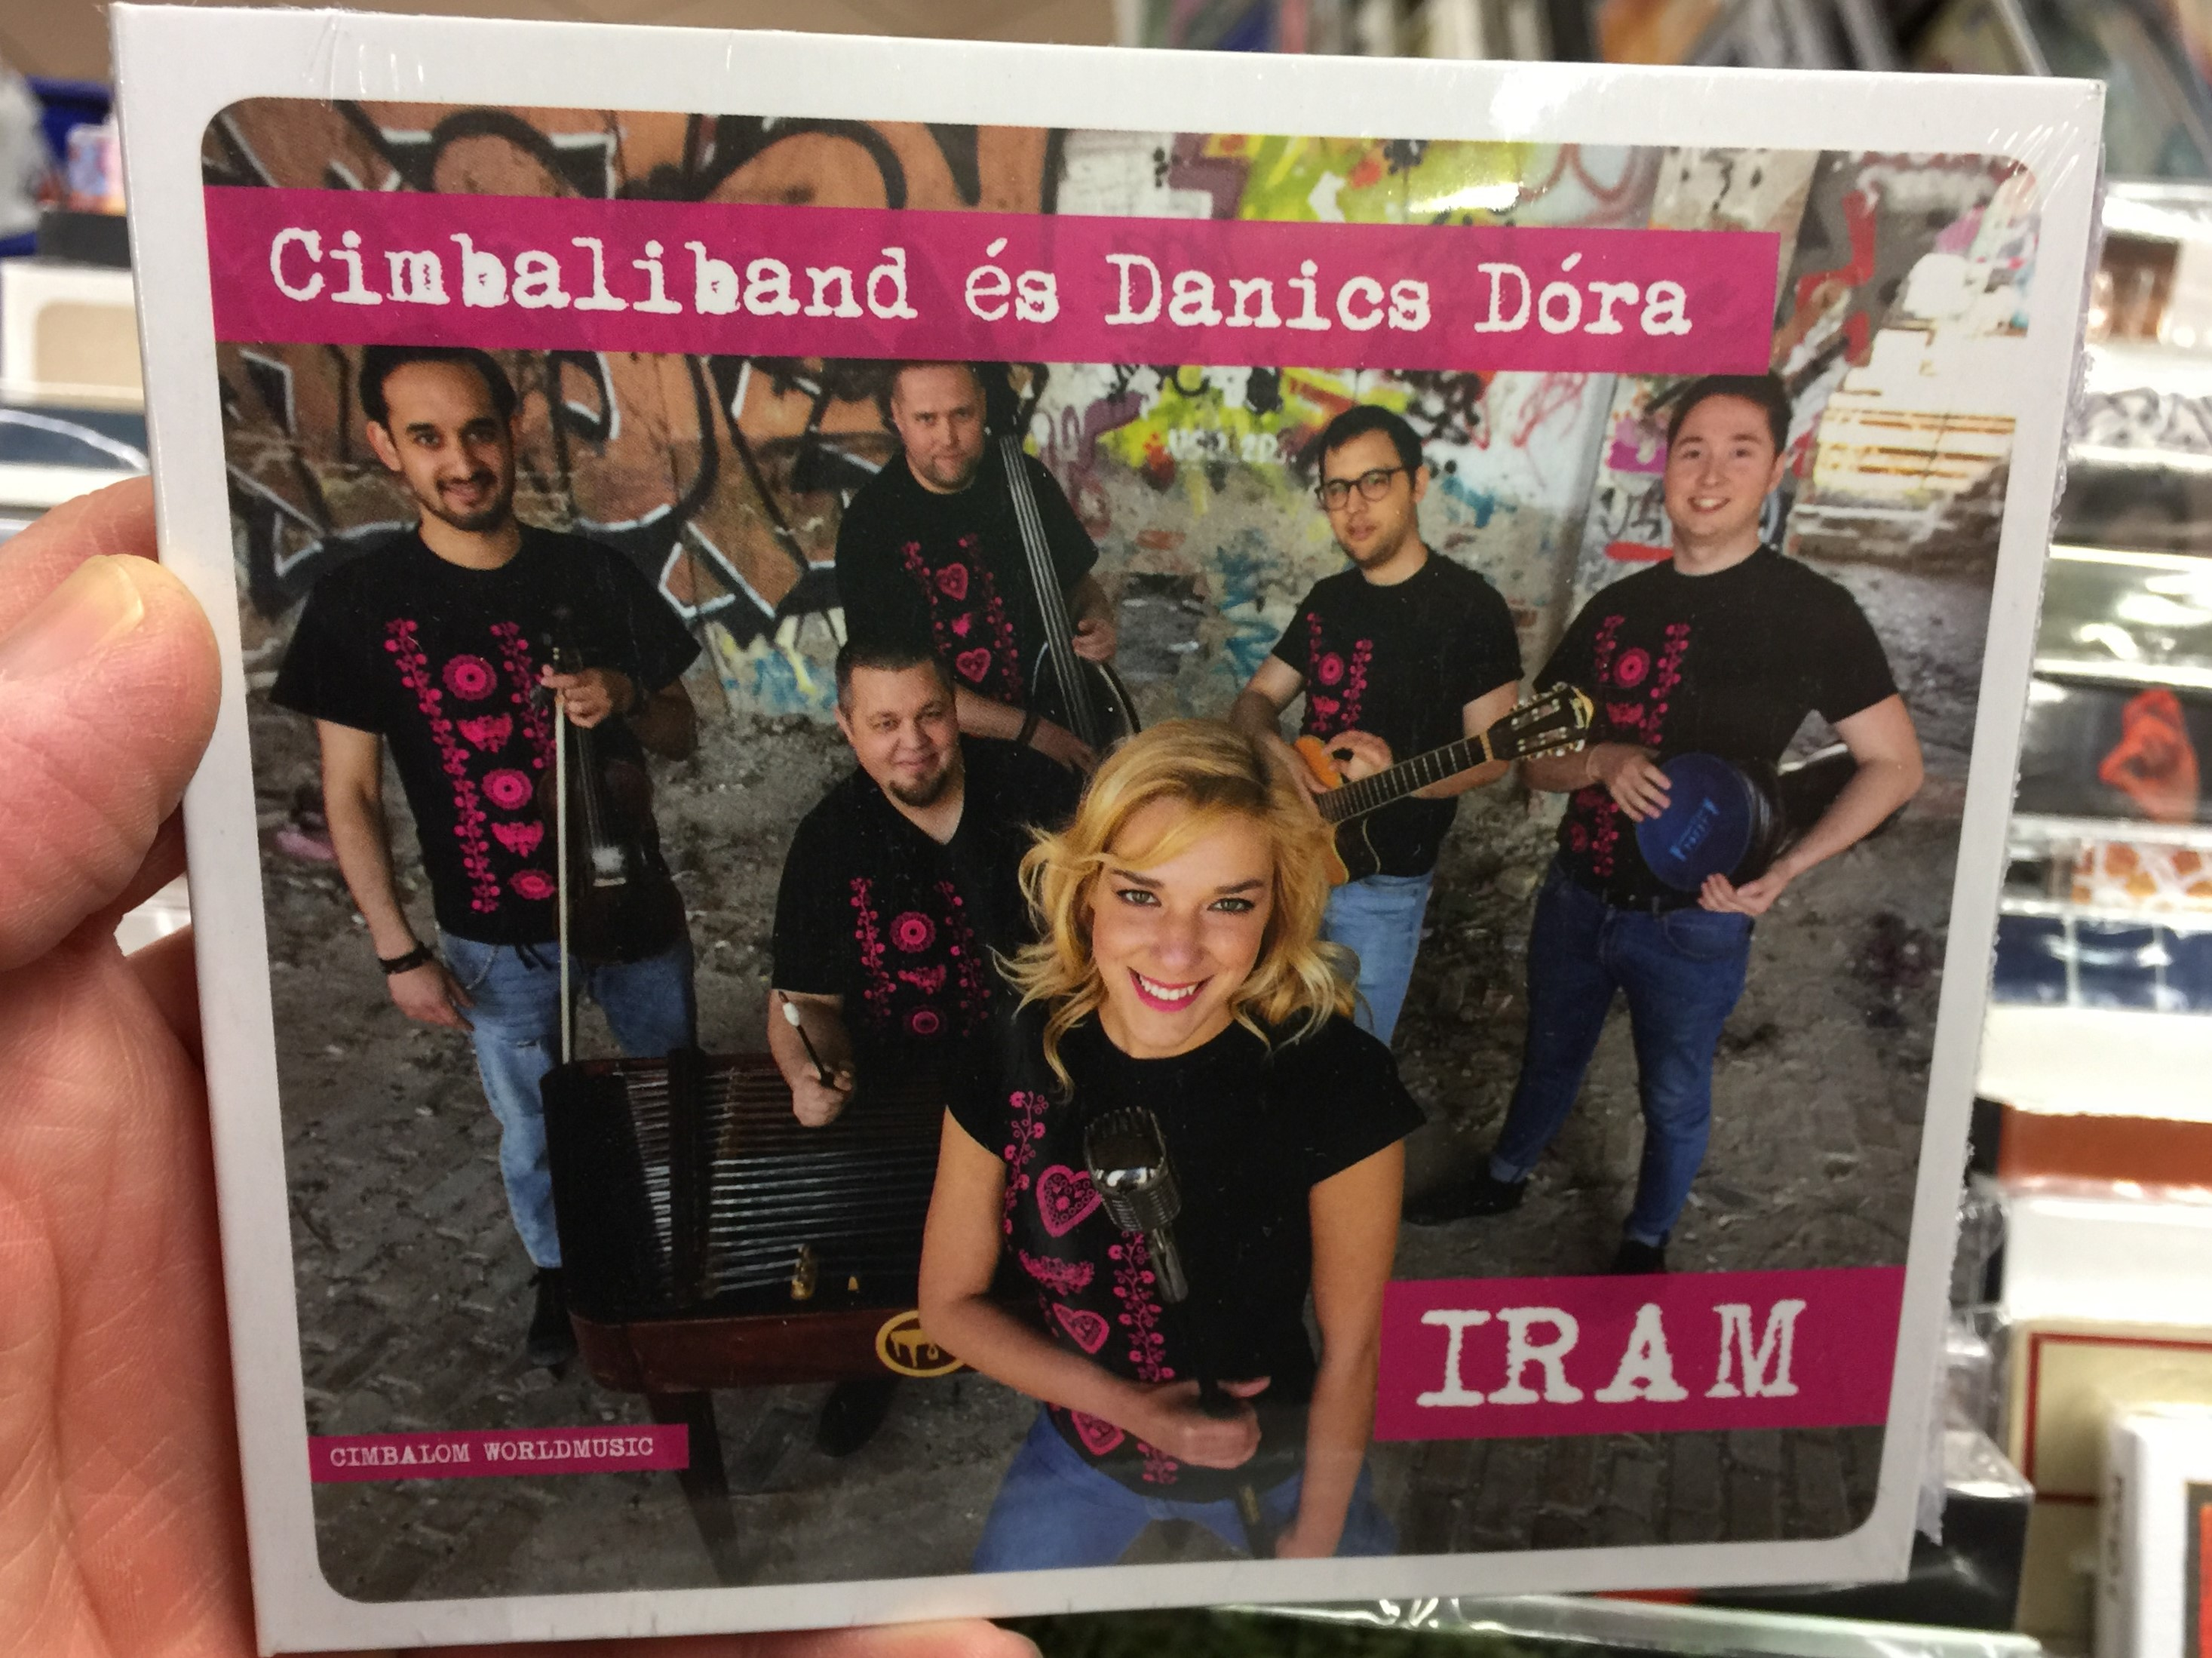 cimbaliband-es-danics-dora-iram-fon-records-audio-cd-2019-5998048543823-1-.jpg